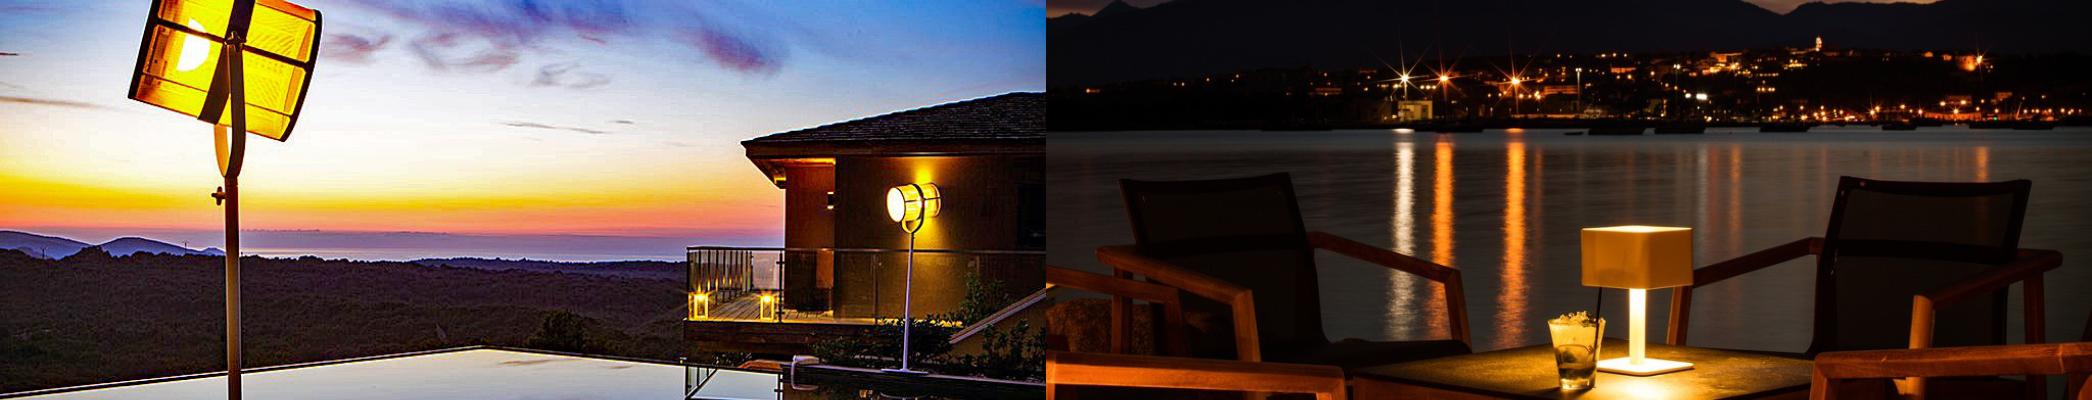 Outdoor Lighting Settings